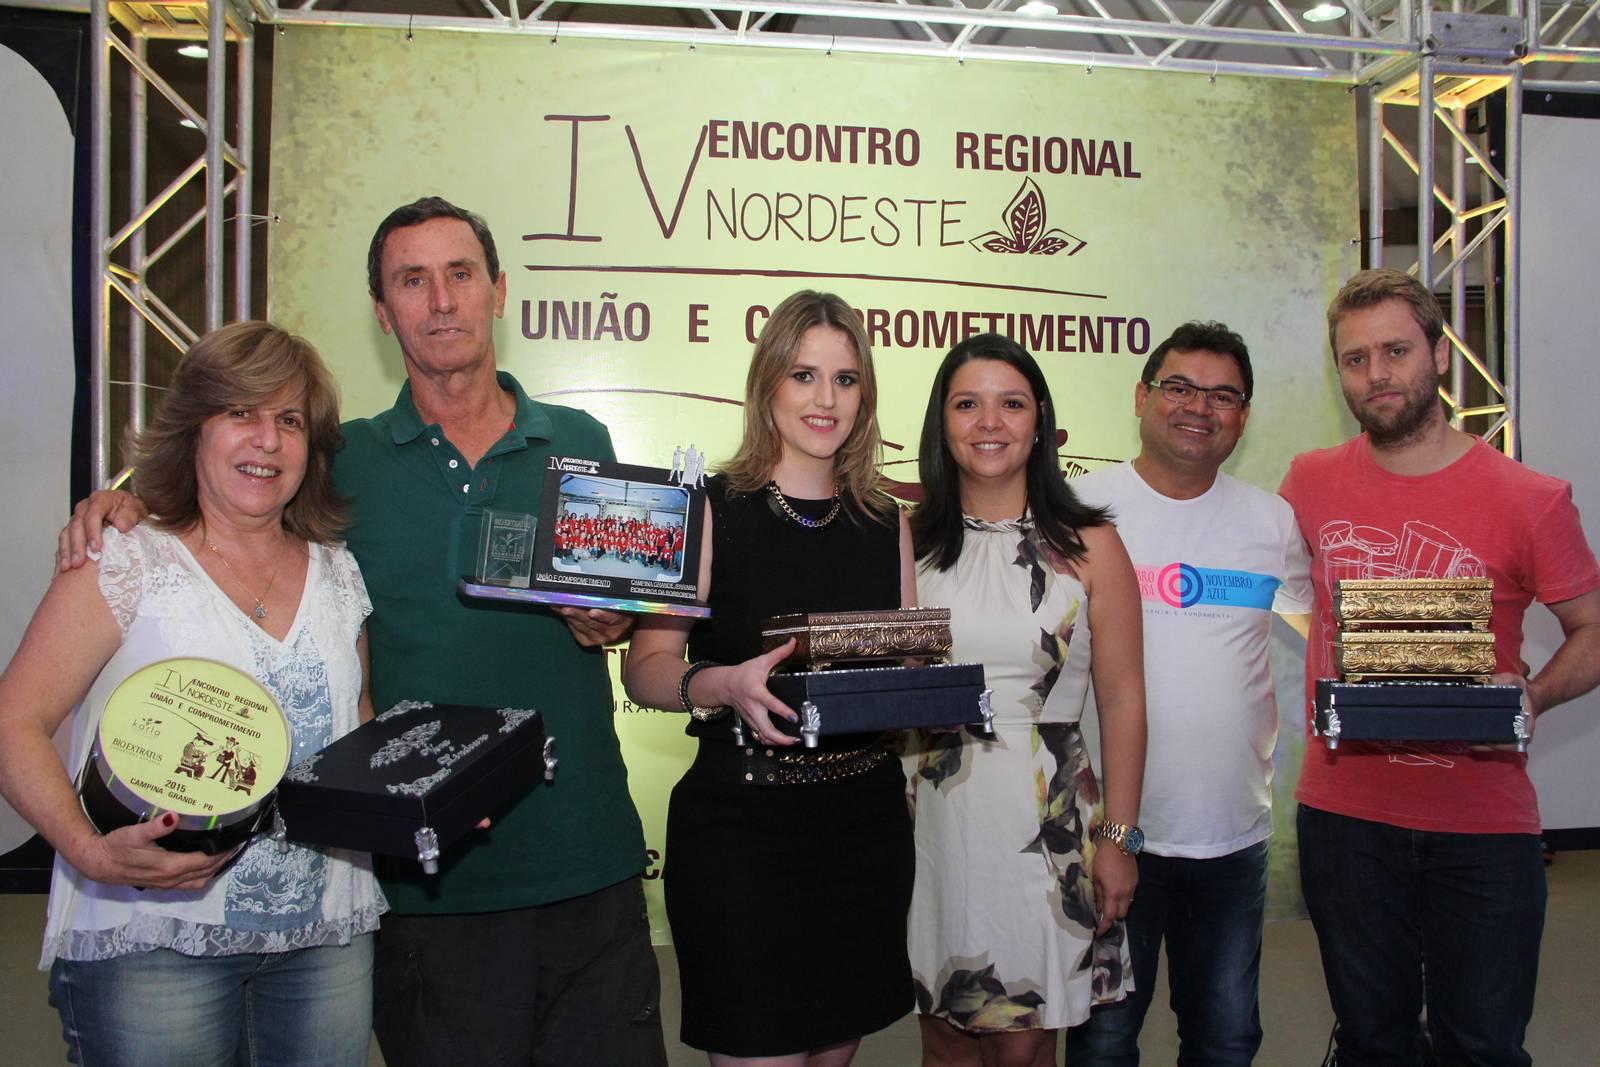 IV Encontro Regional do Nordeste - Bio Extratus (333)